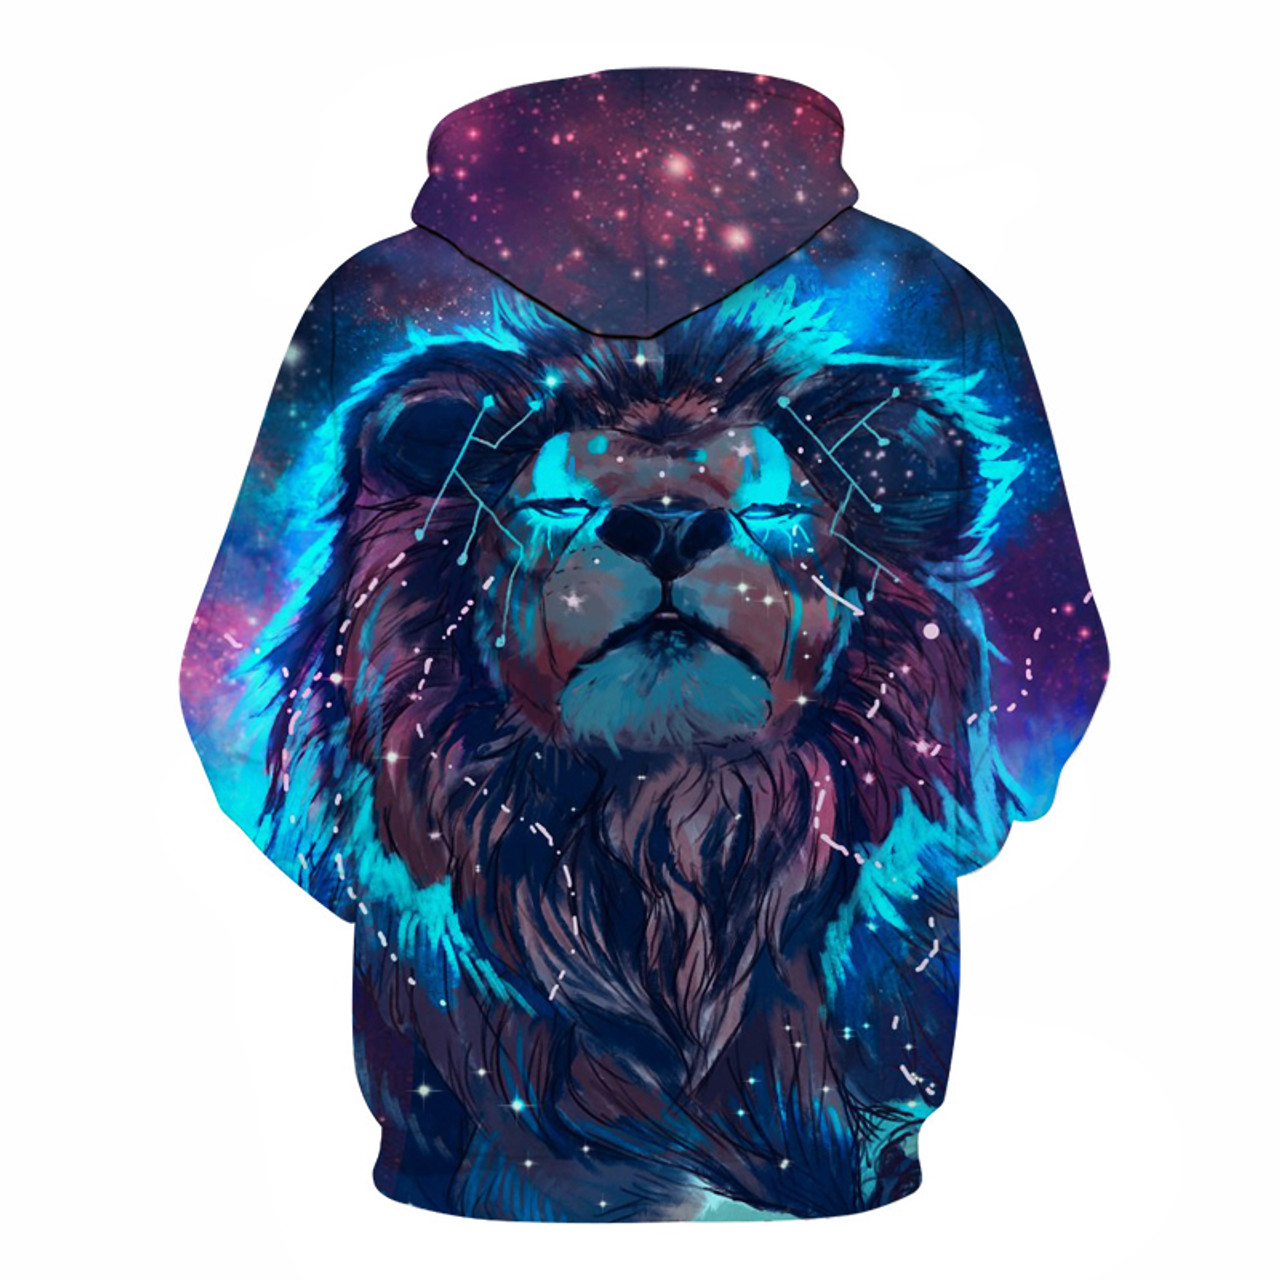 a1782809d7ef ... Lion Constellation Printed Hoodies 3D Men Women Hooded Pullover 6XL  Sweatshirts Casual Pocket Outwear Novelty Coat ...